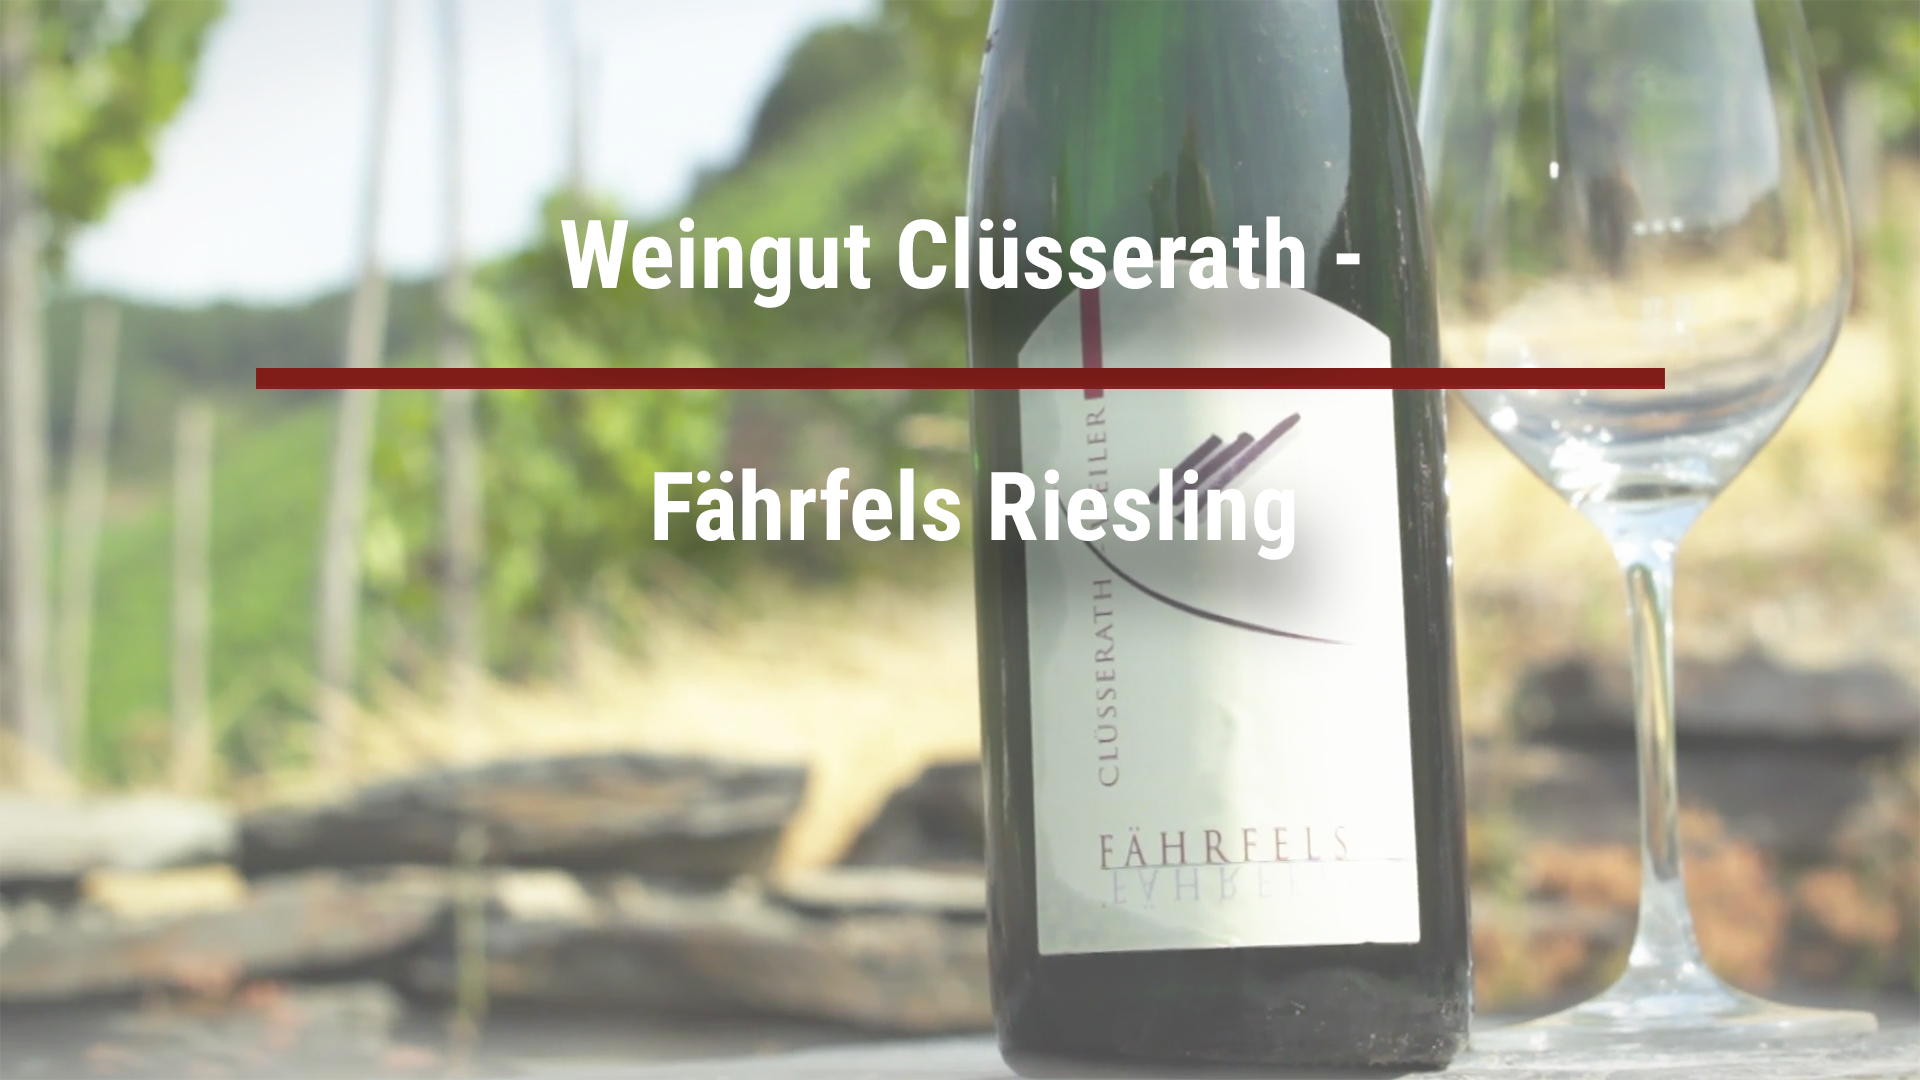 Winery Clüsserath – Fährfels Riesling